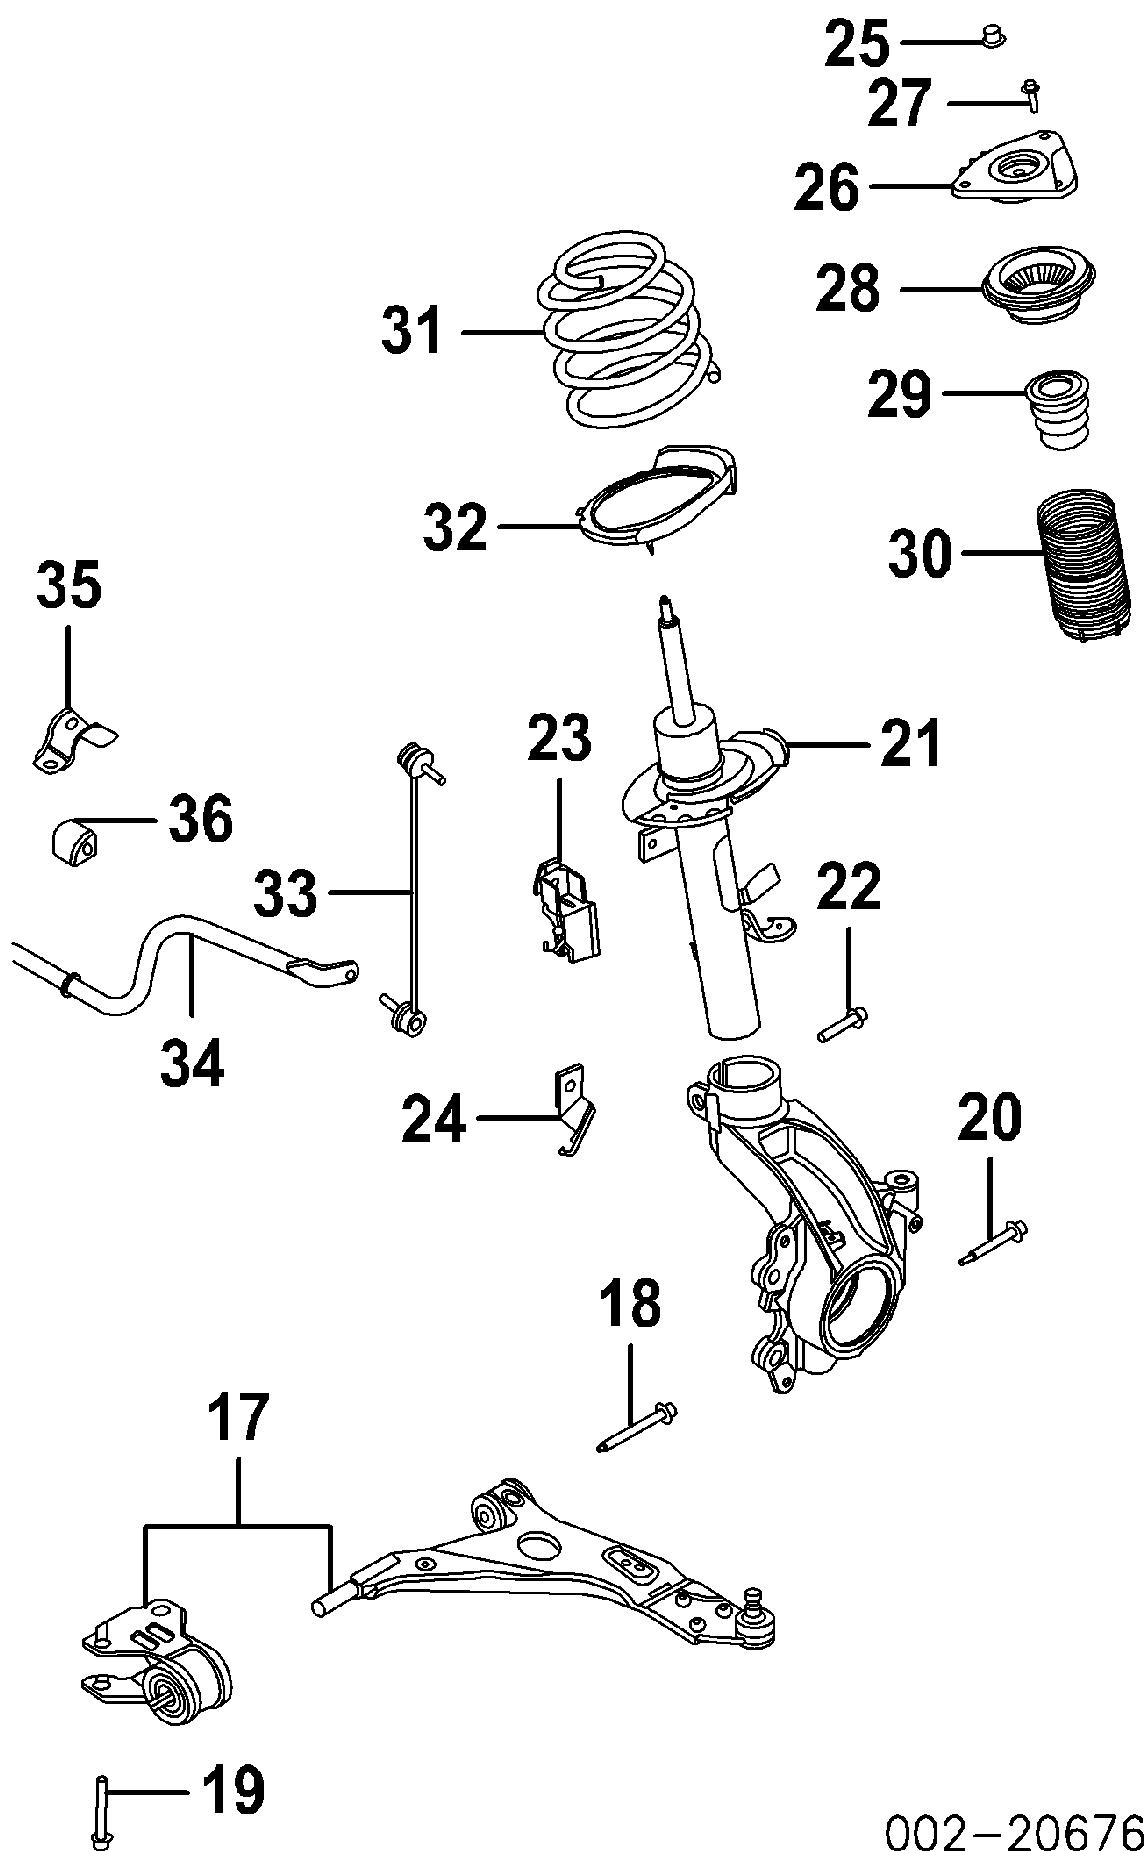 Ford Escape Se Front Suspension